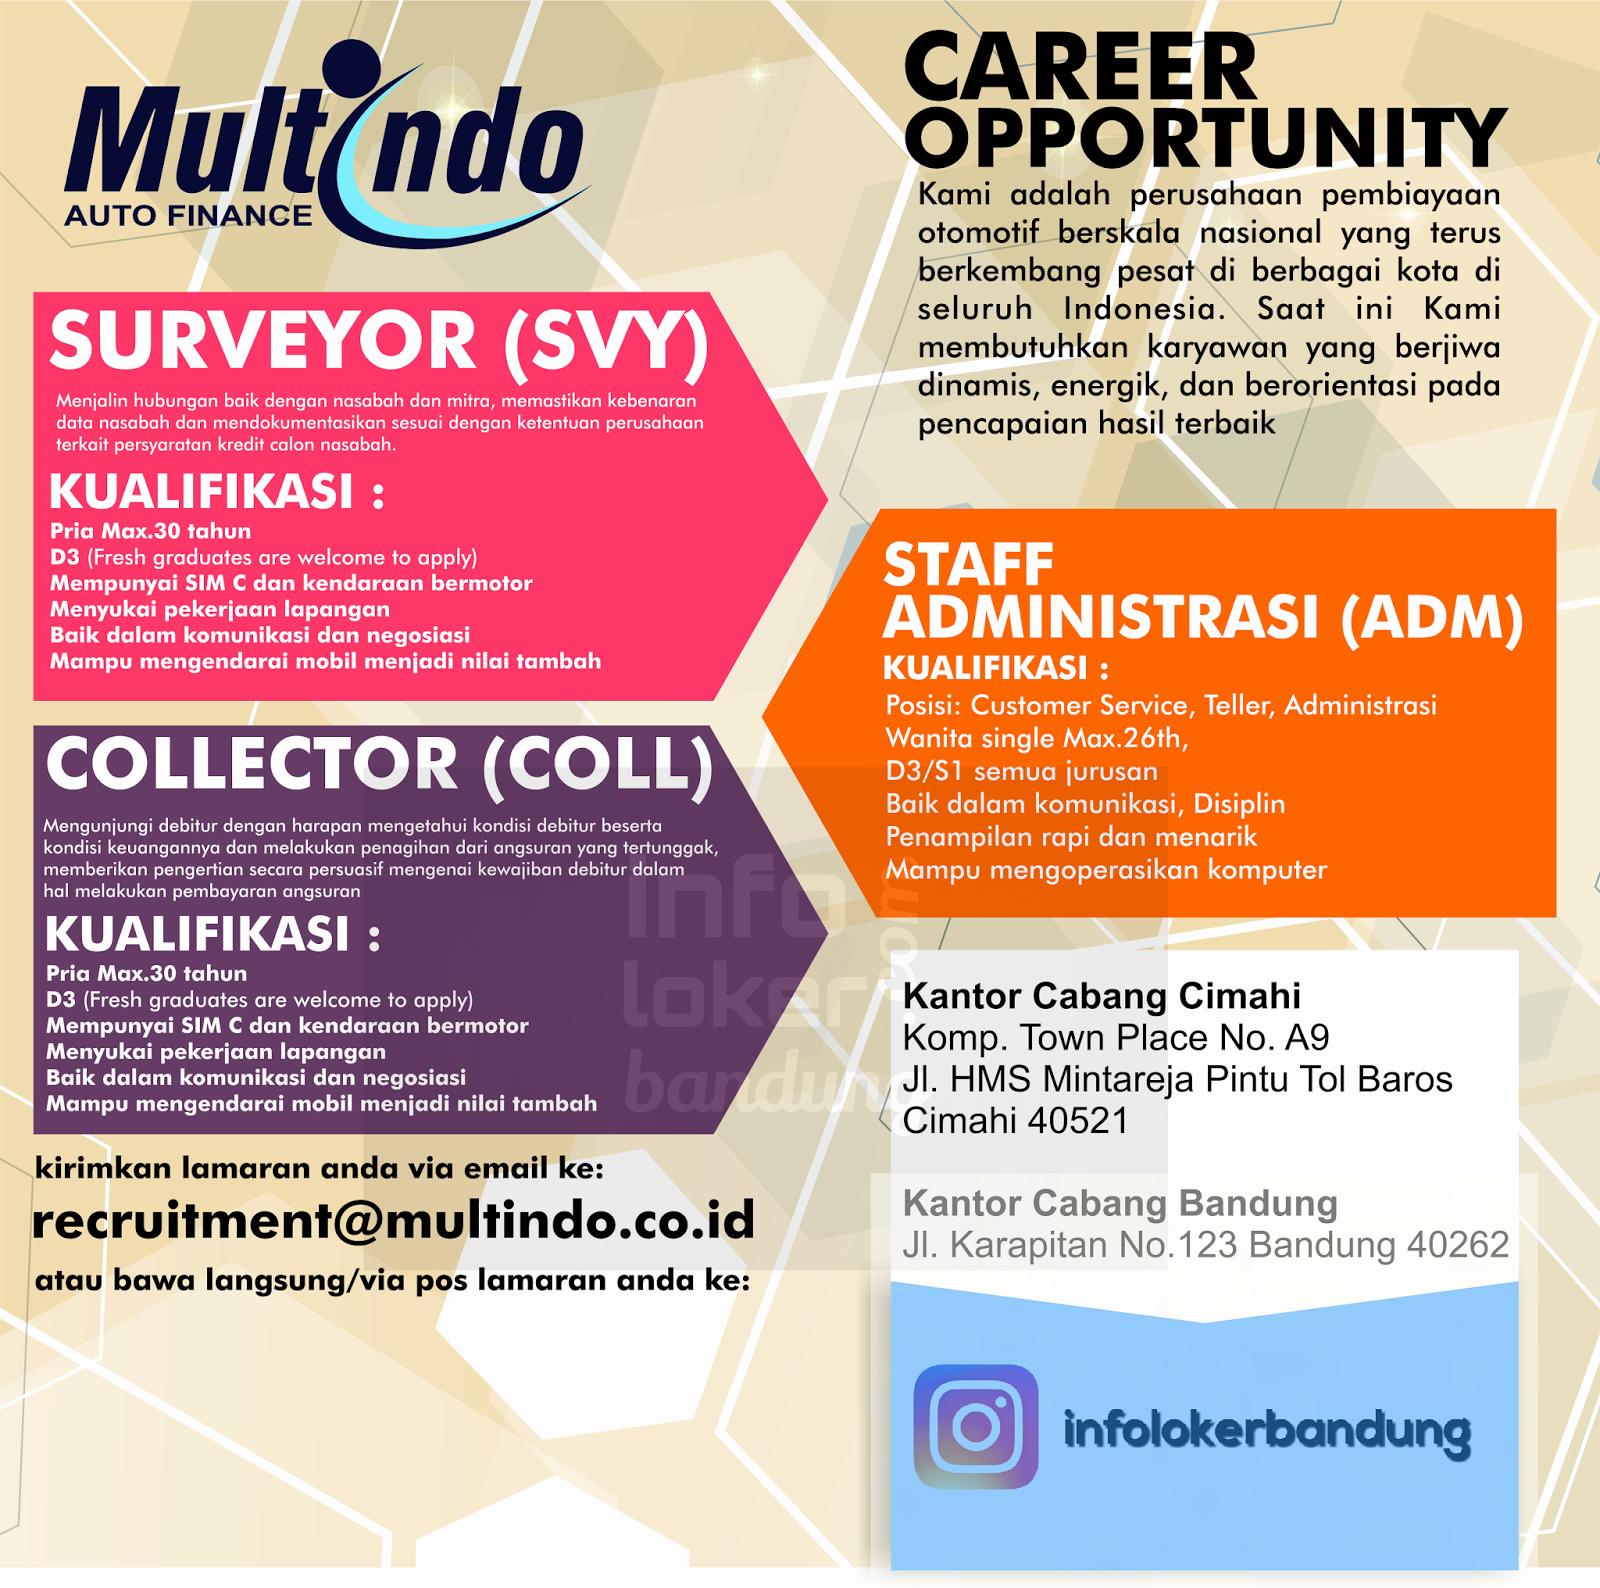 Lowongan Kerja PT Multindo Auto Finance Bandung Januari 2017